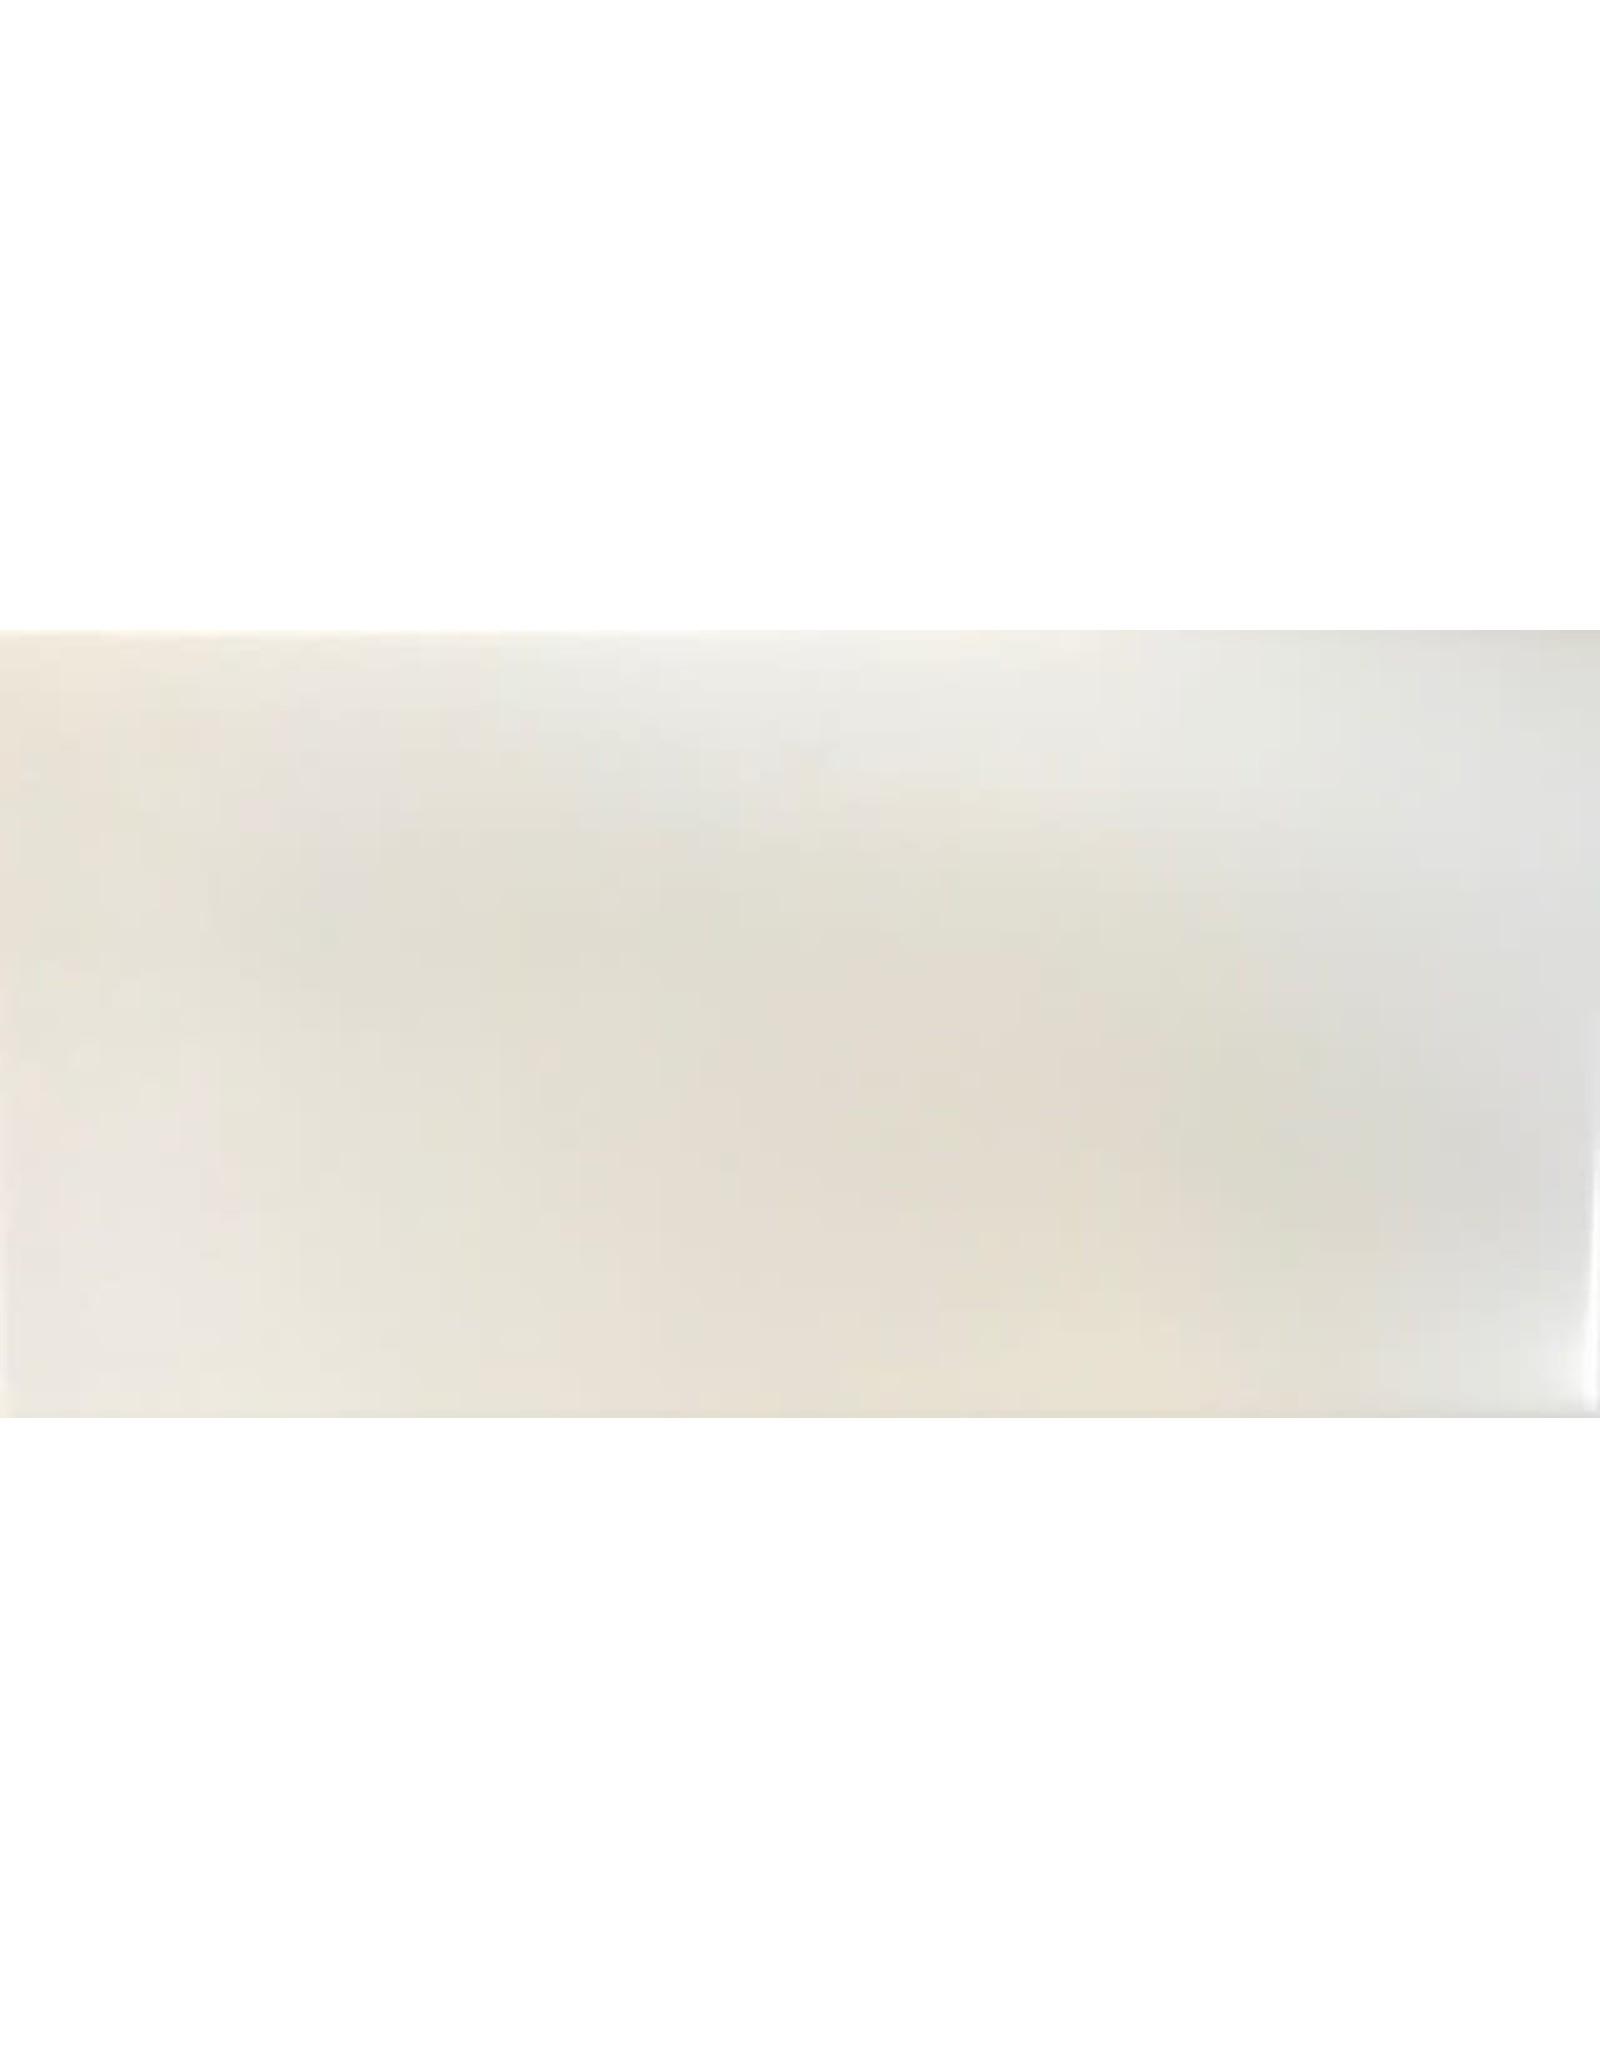 Eternity Tiles 300x600, Matt White Rect, Wall Tile,  Price Per Piece